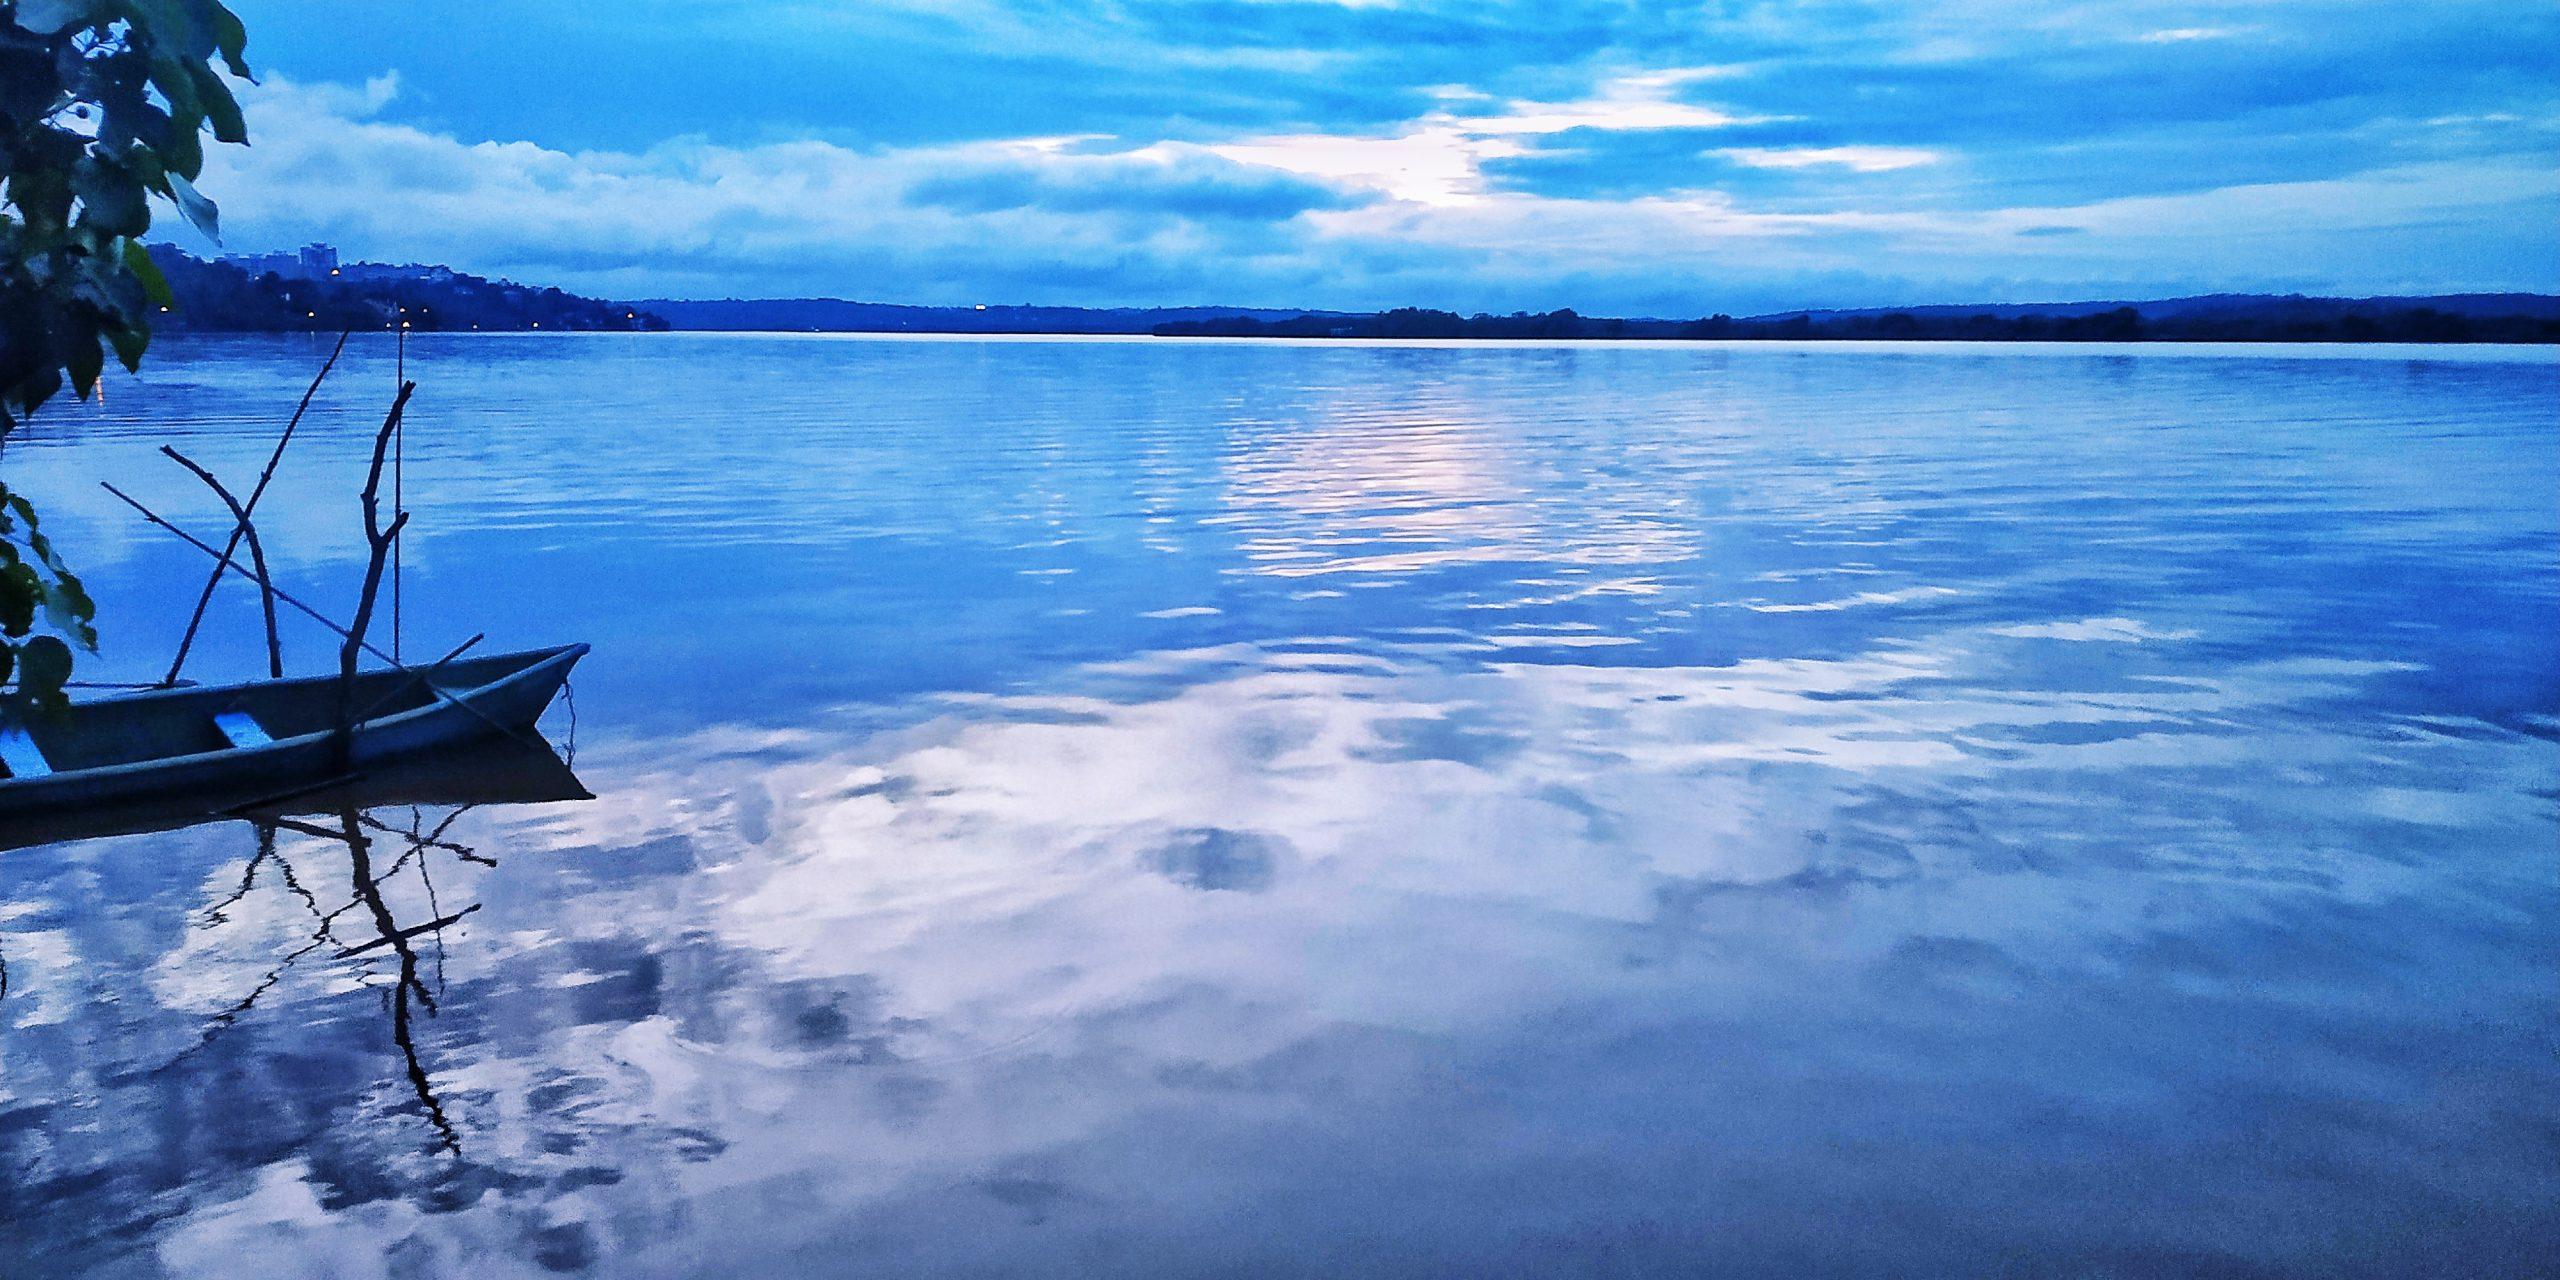 Blue River Landscape